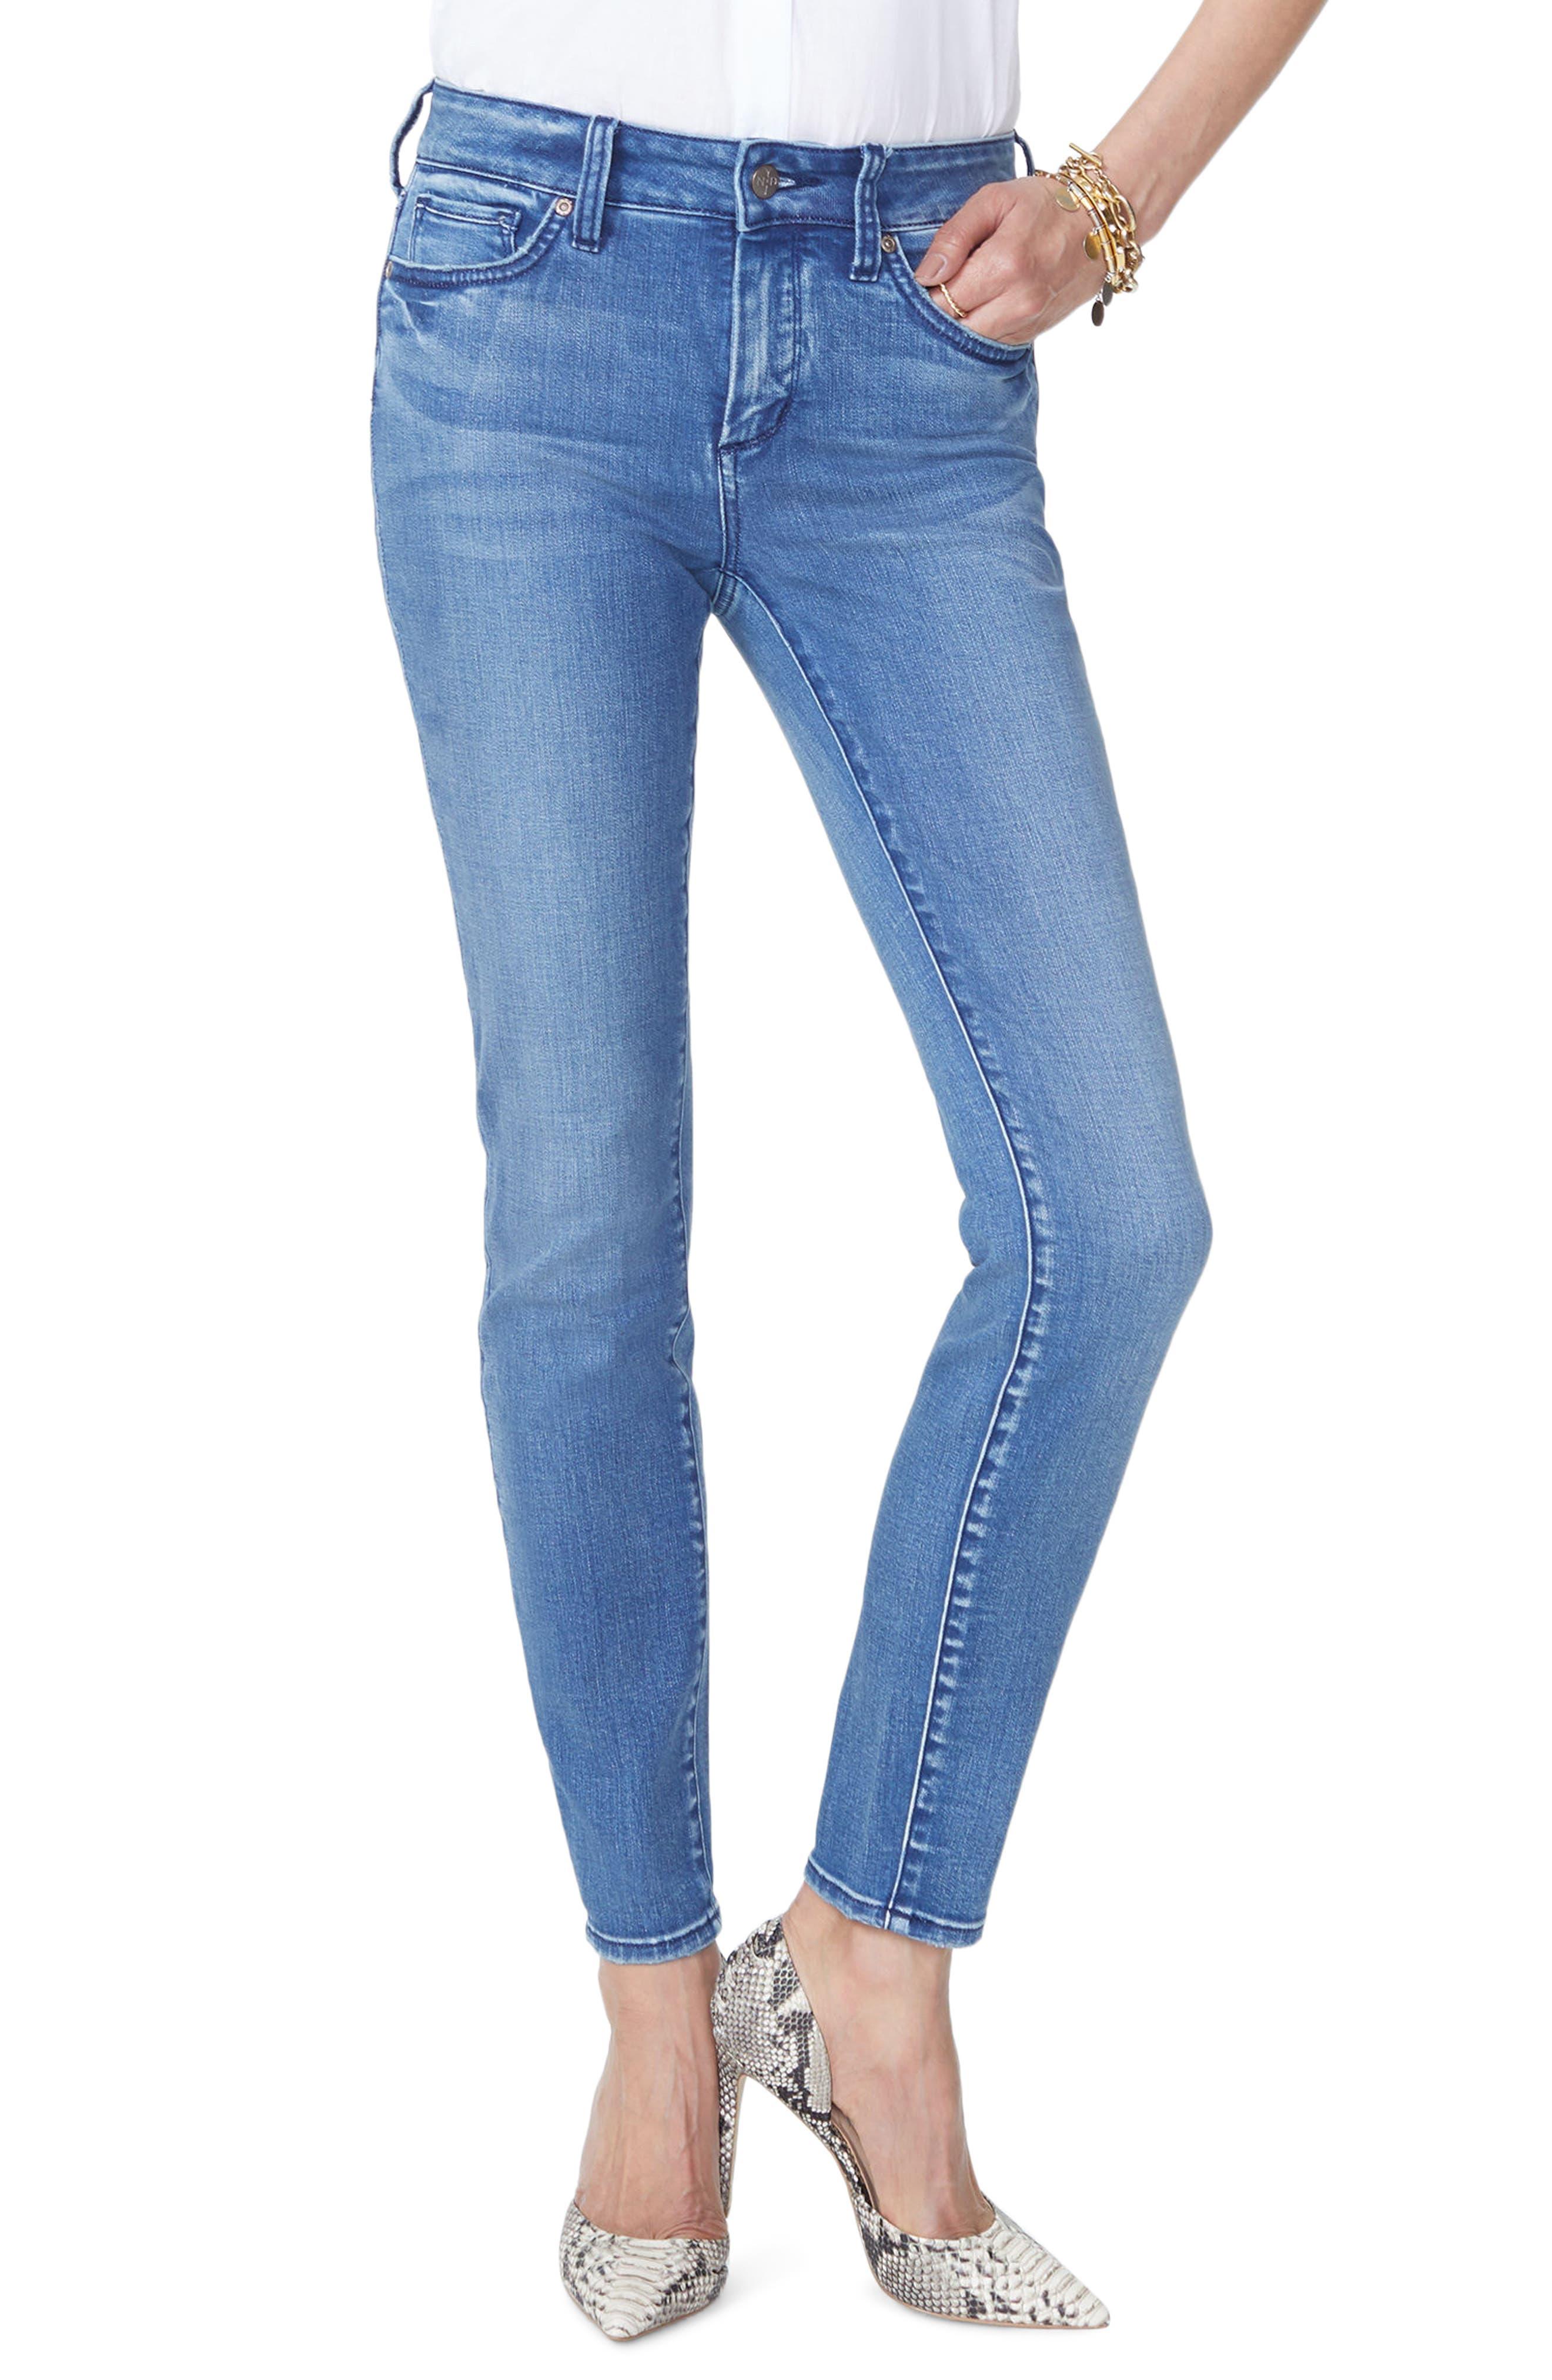 Ami High Waist Stretch Skinny Jeans,                         Main,                         color, WISHFUL